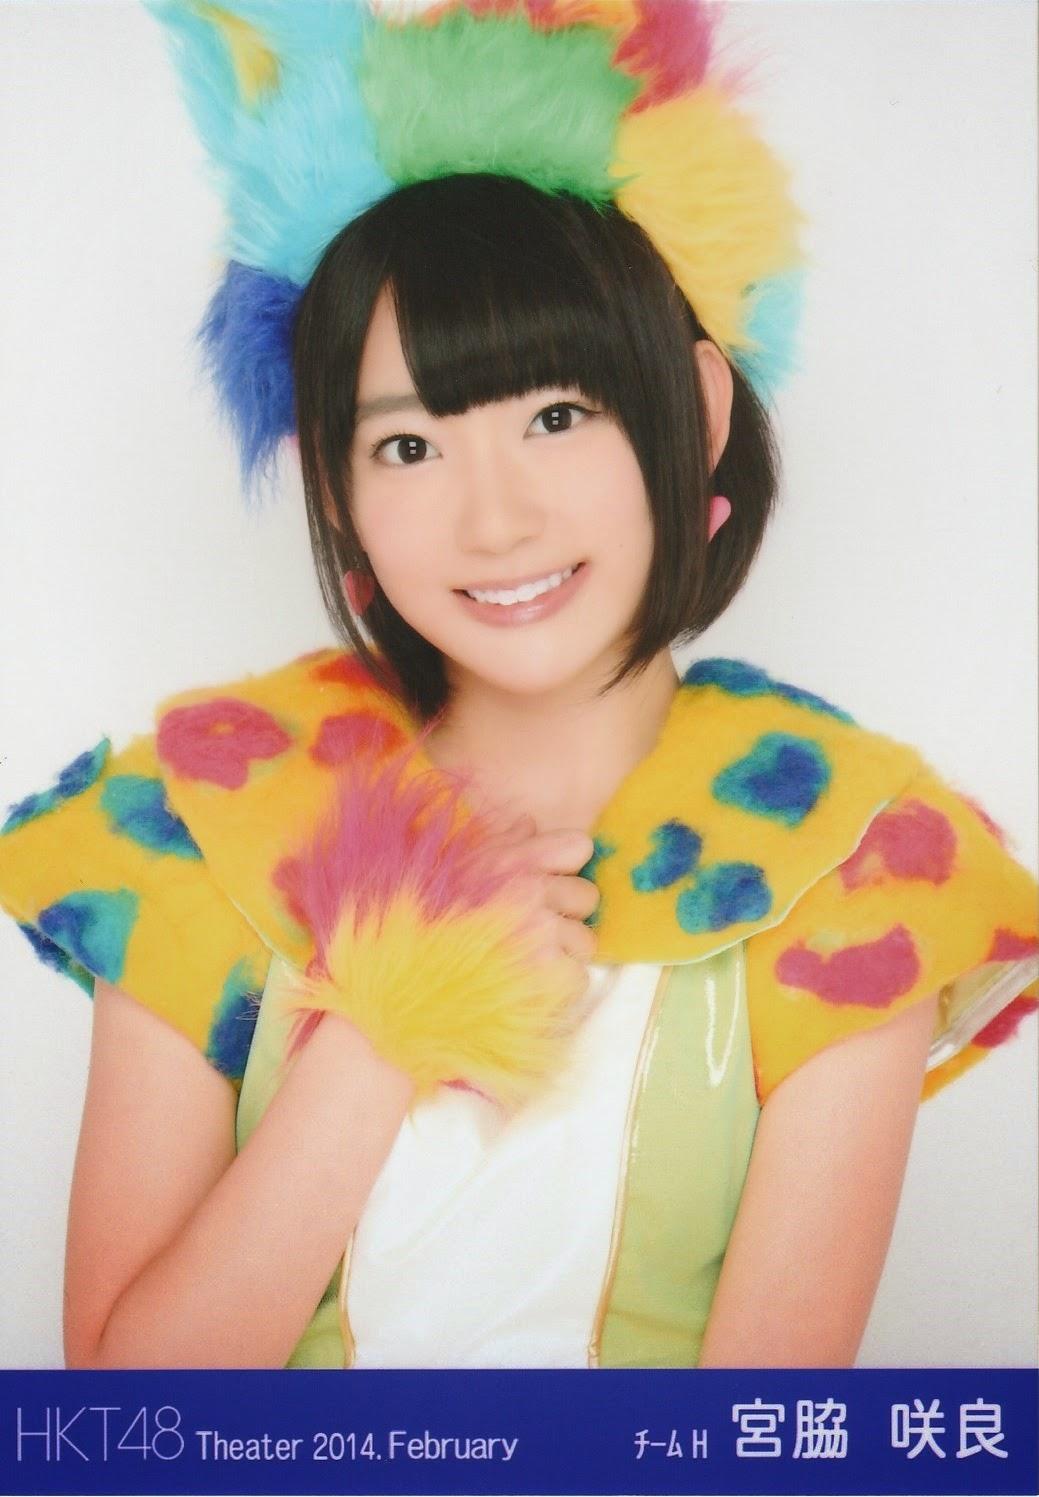 Photopack Miyawaki Sakura Hkt48 Theater February 2014 Dorahana Blog